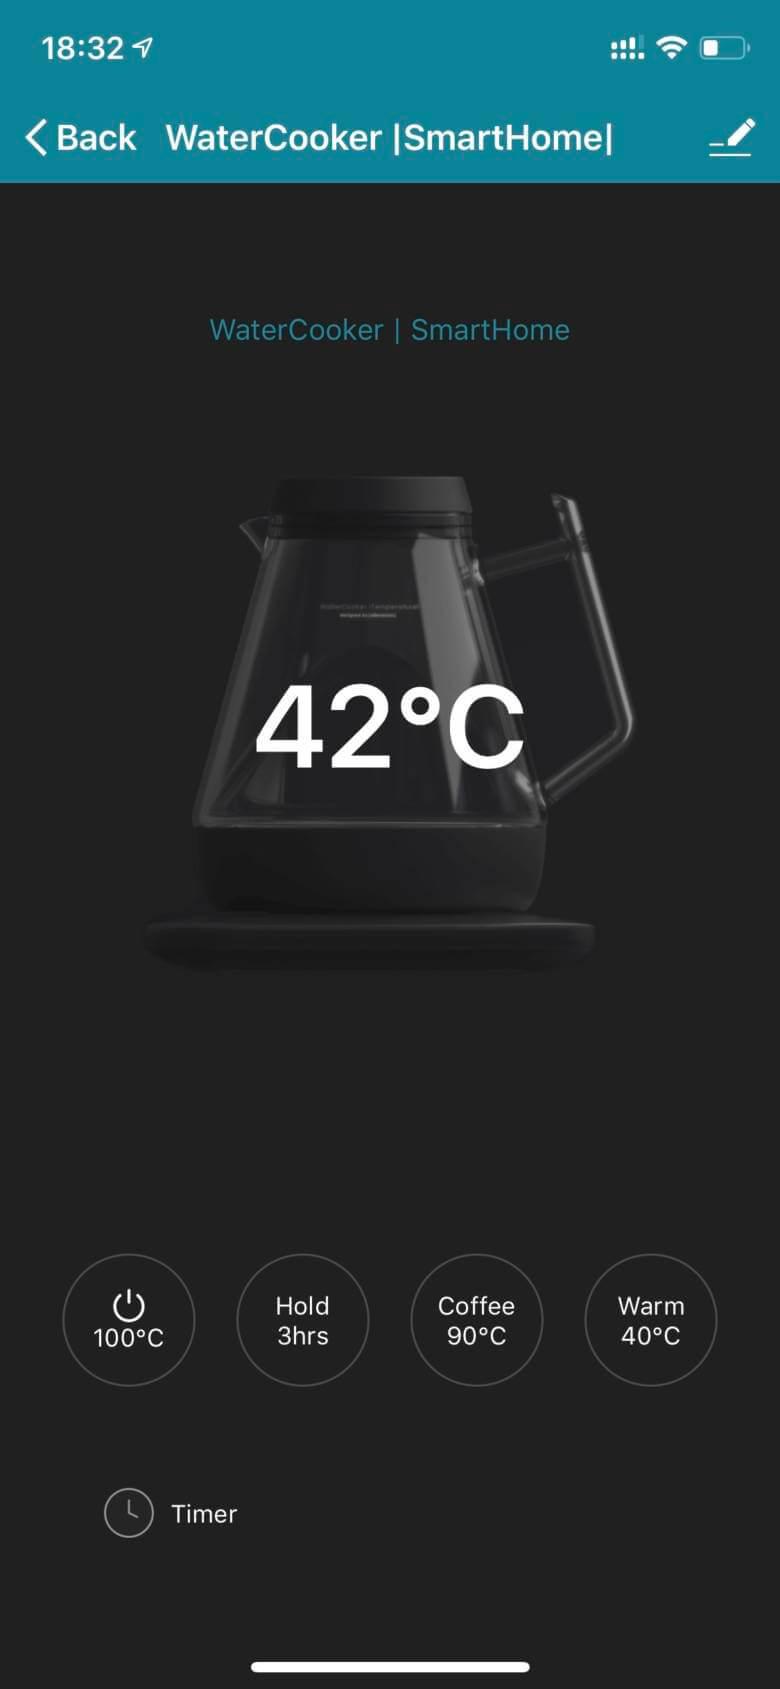 WaterCooker |SmartHome|アプリのインターフェース